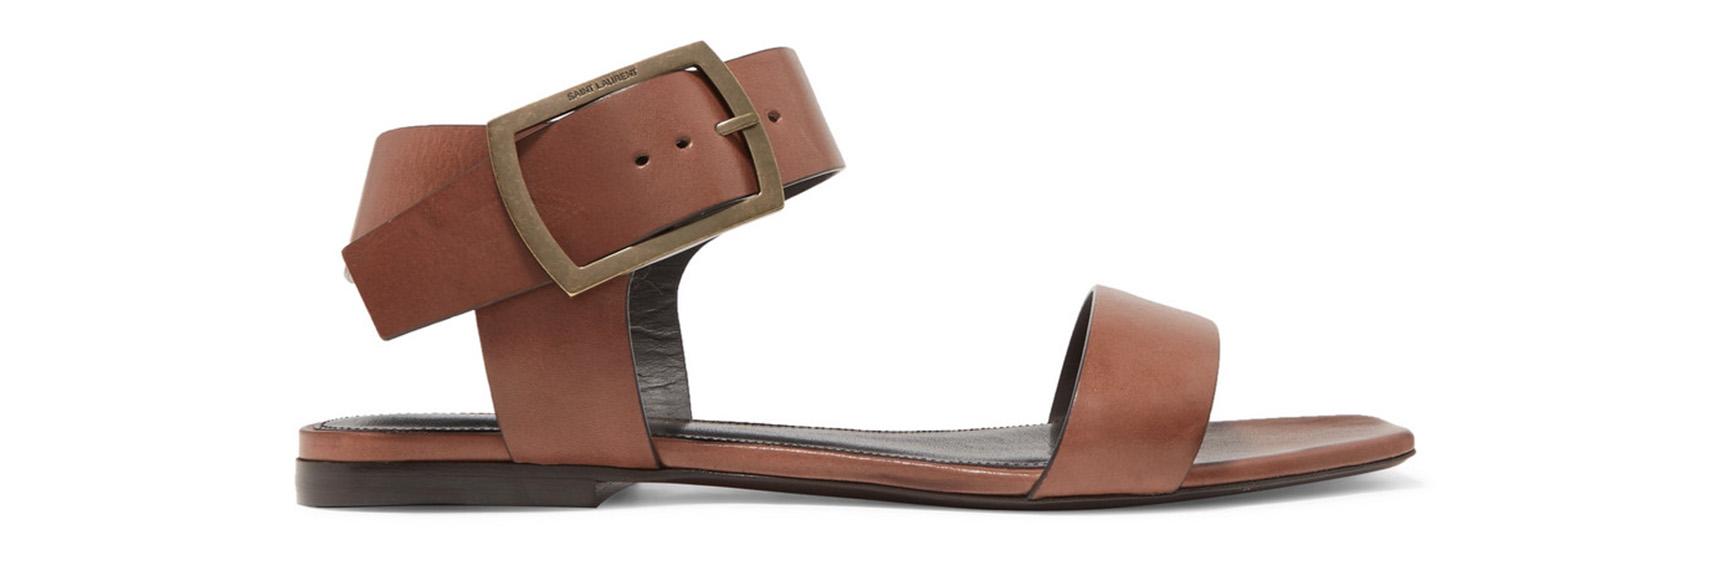 Oak Leather Sandals